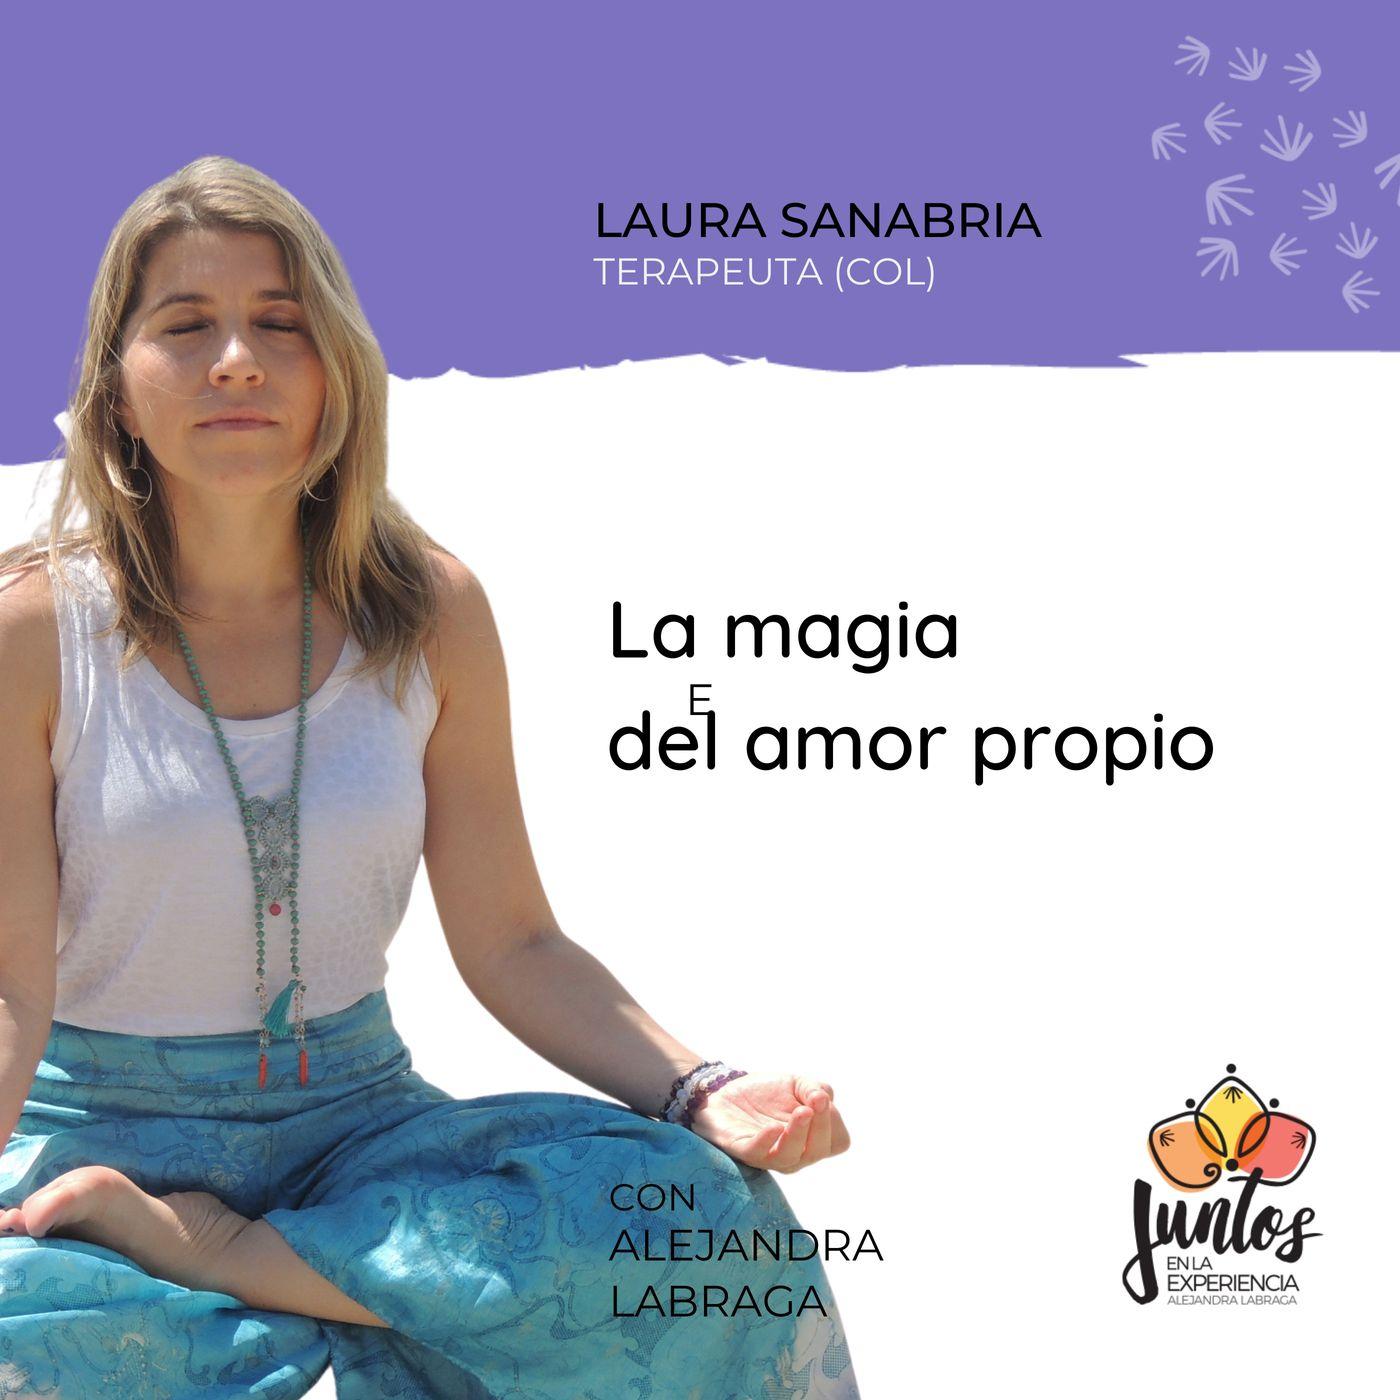 Ep. 072 - La magia del amor propio con Laura Sanabria